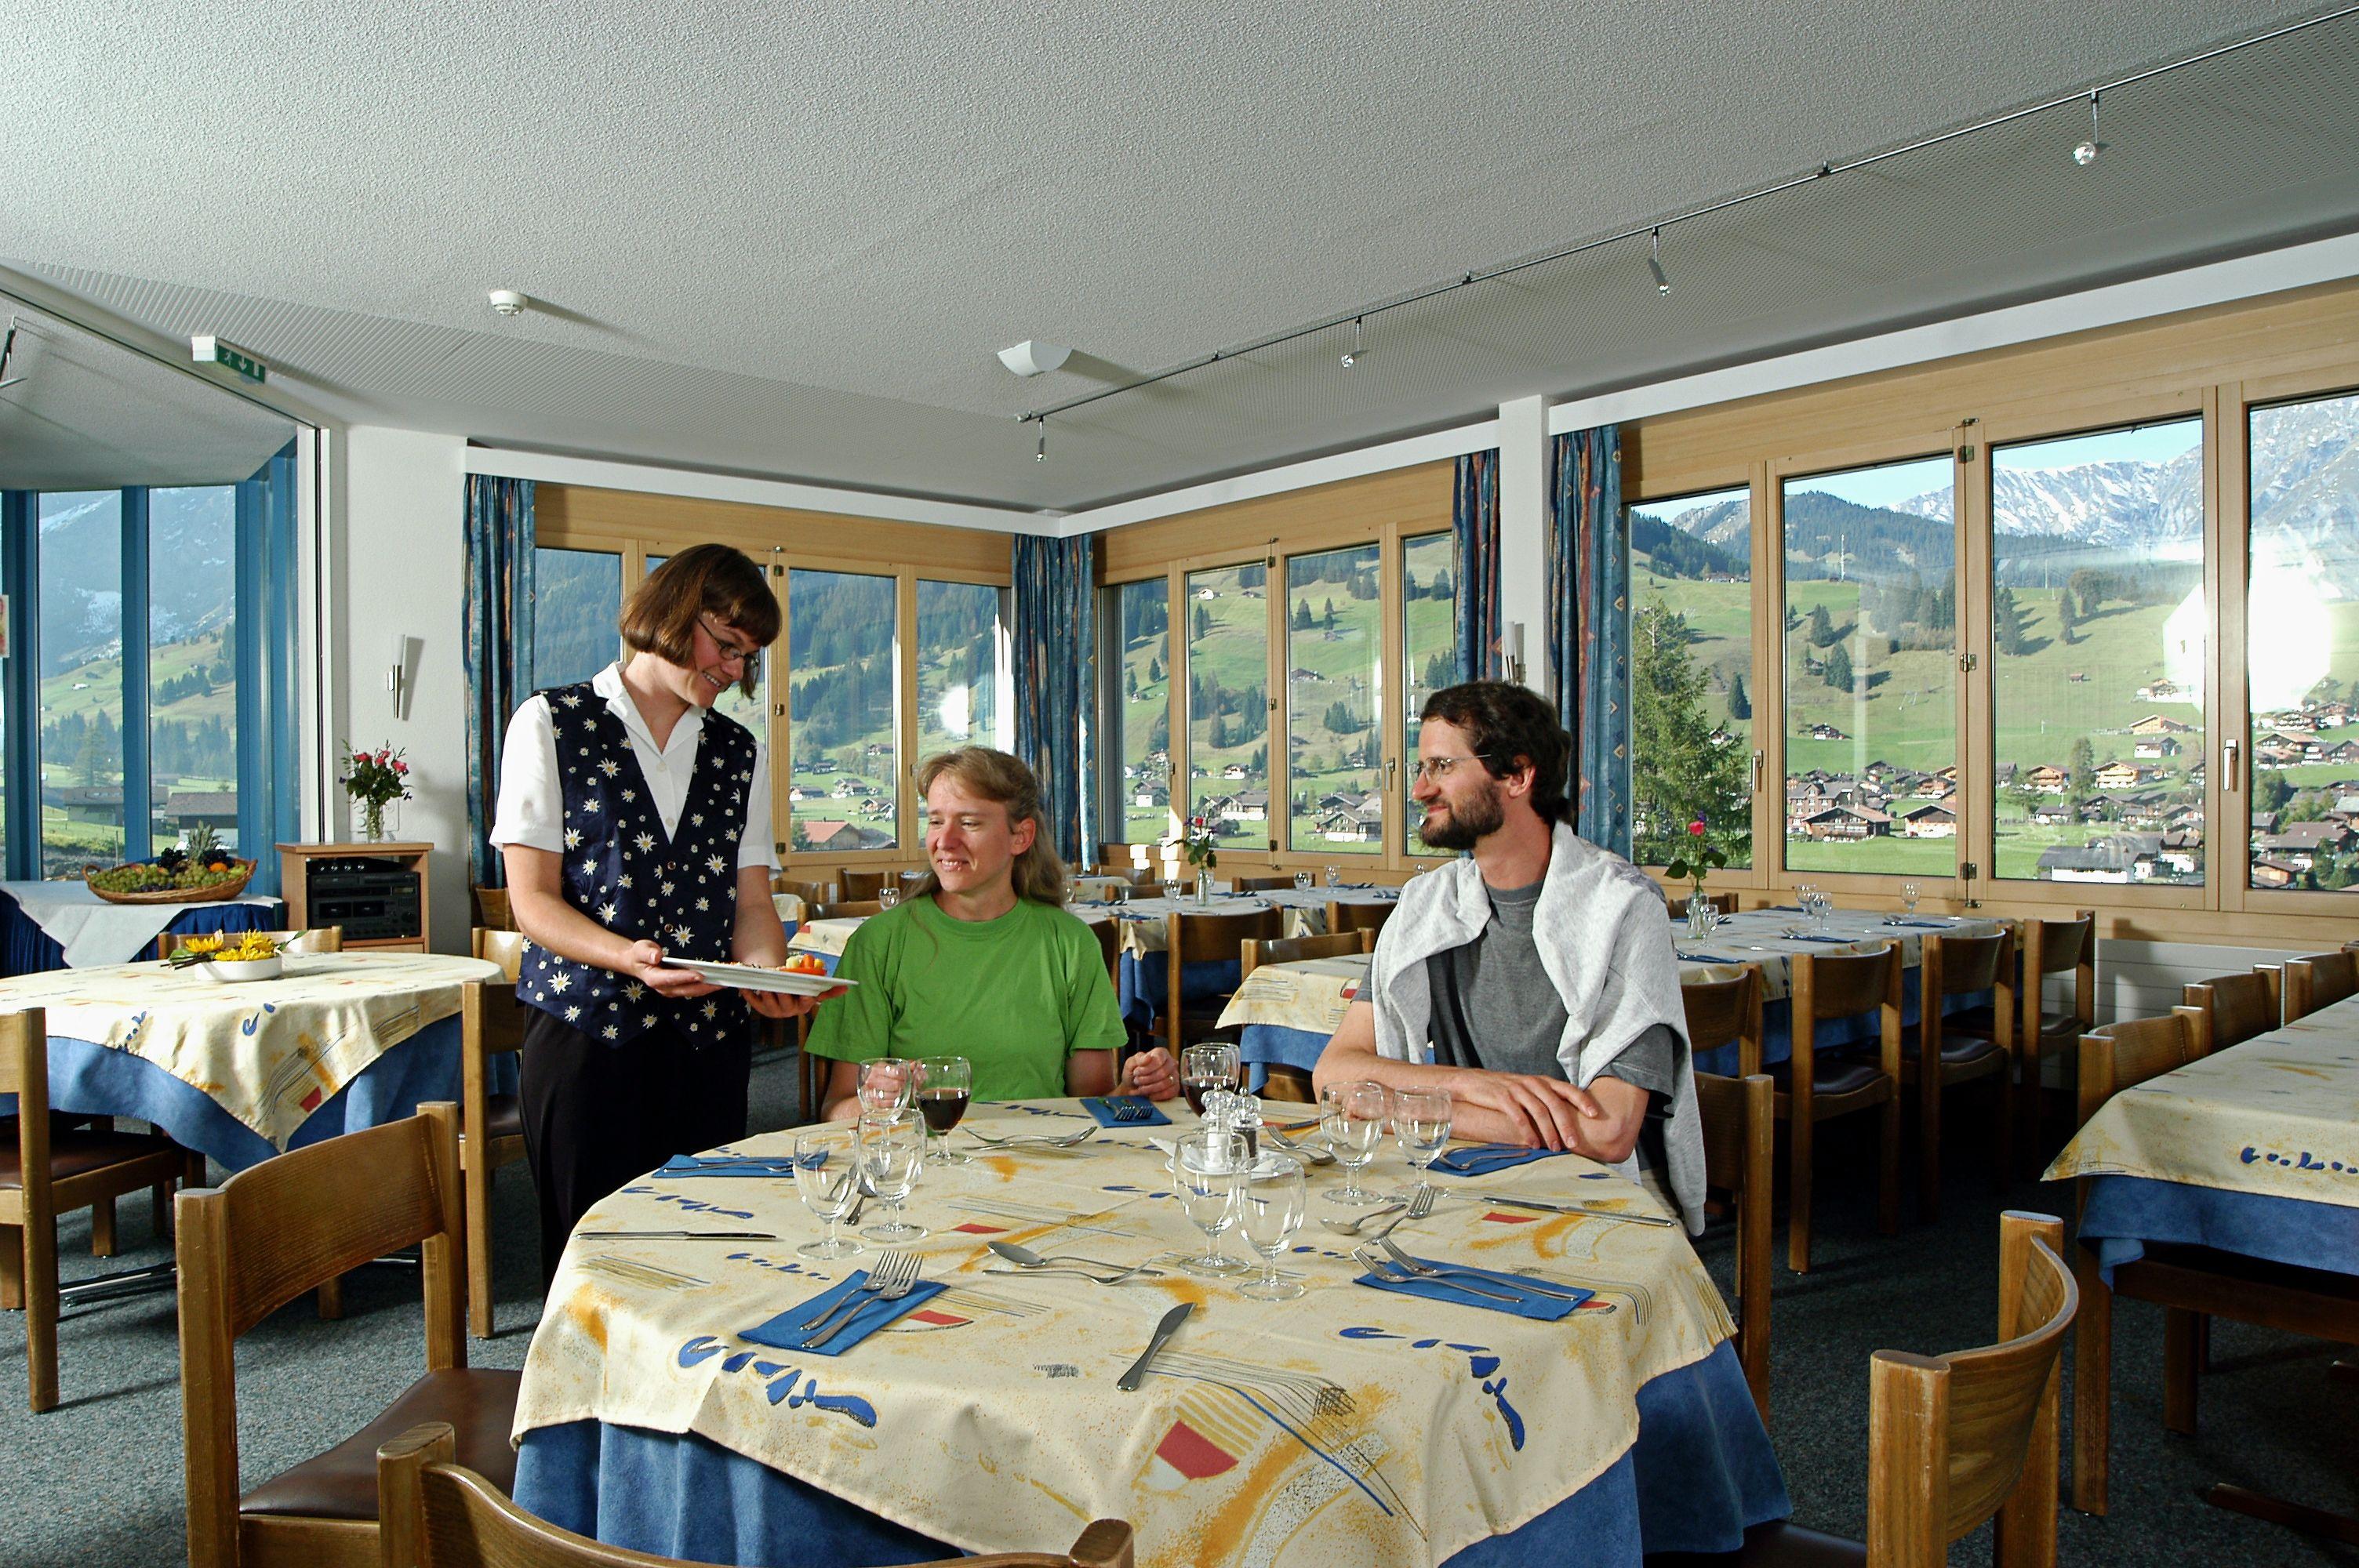 Hotel Alpina Restaurant Adelboden Berner Oberland Switzerland - Hotel alpina adelboden